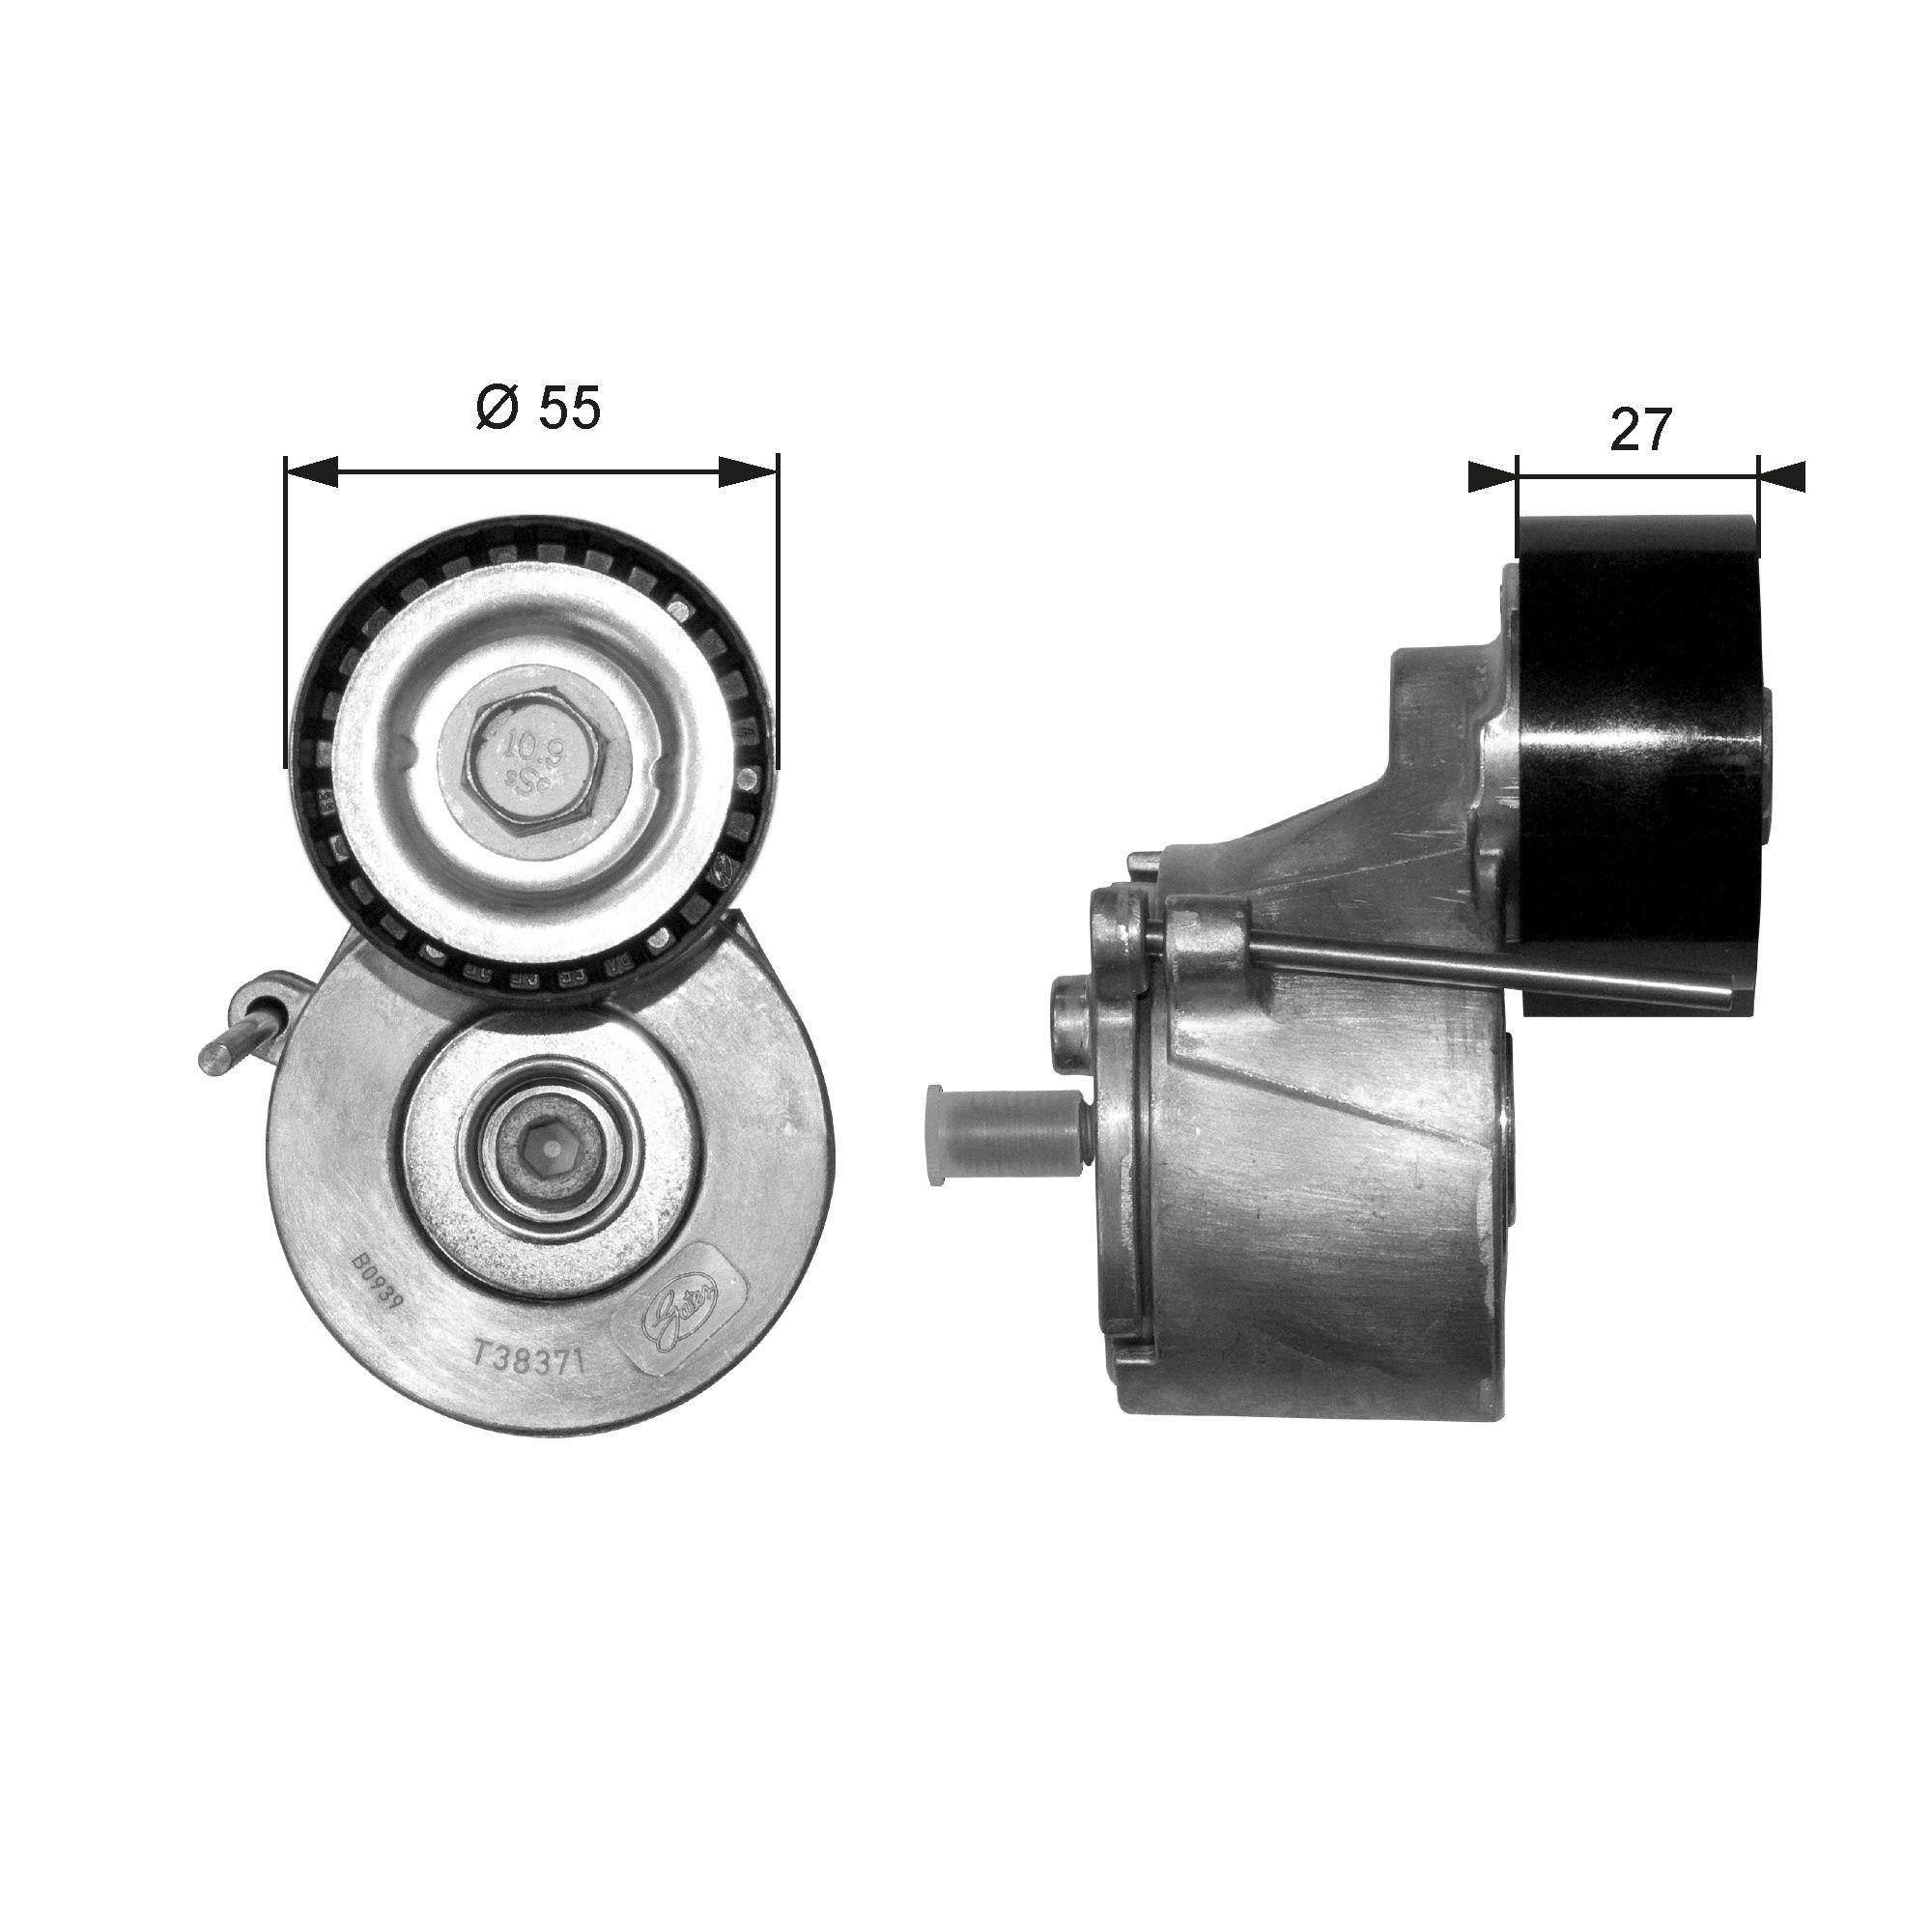 Original FORD Spannrolle T38371